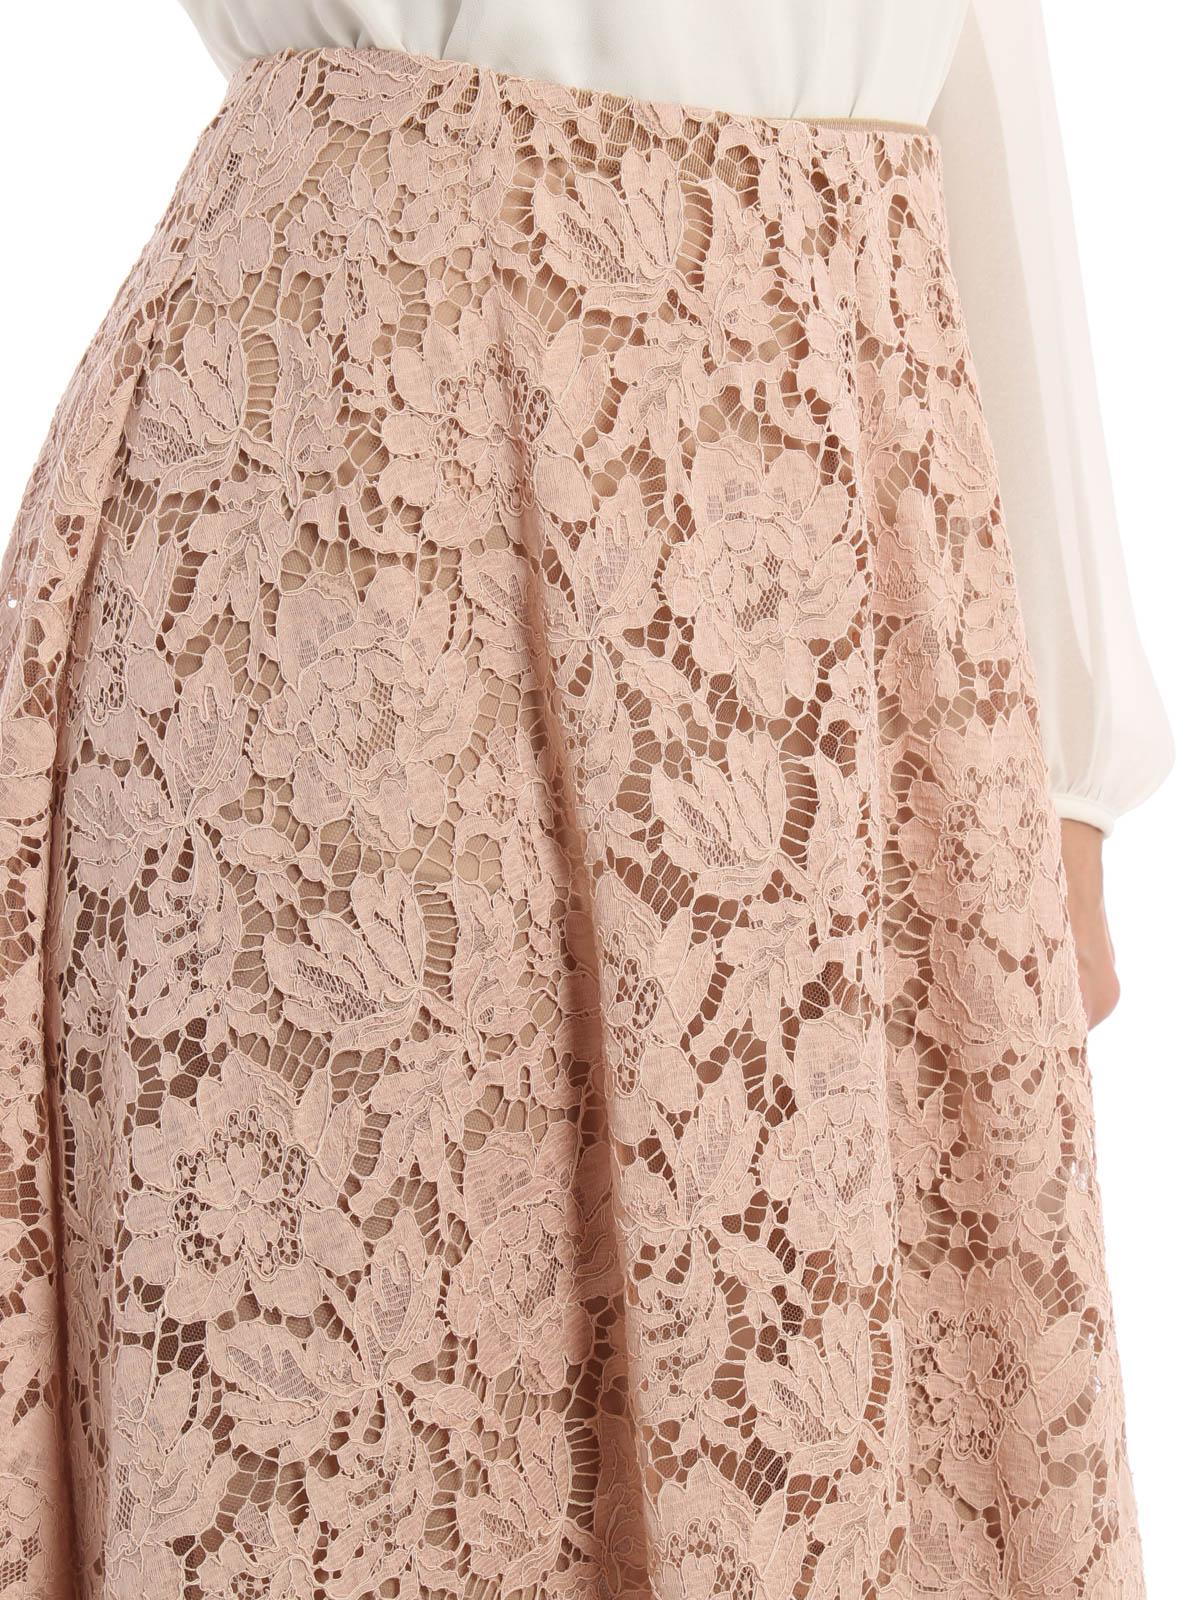 47d3b37b0 Women's Skirts, Short Skirts, Long Skirts, Leather Skirts Online